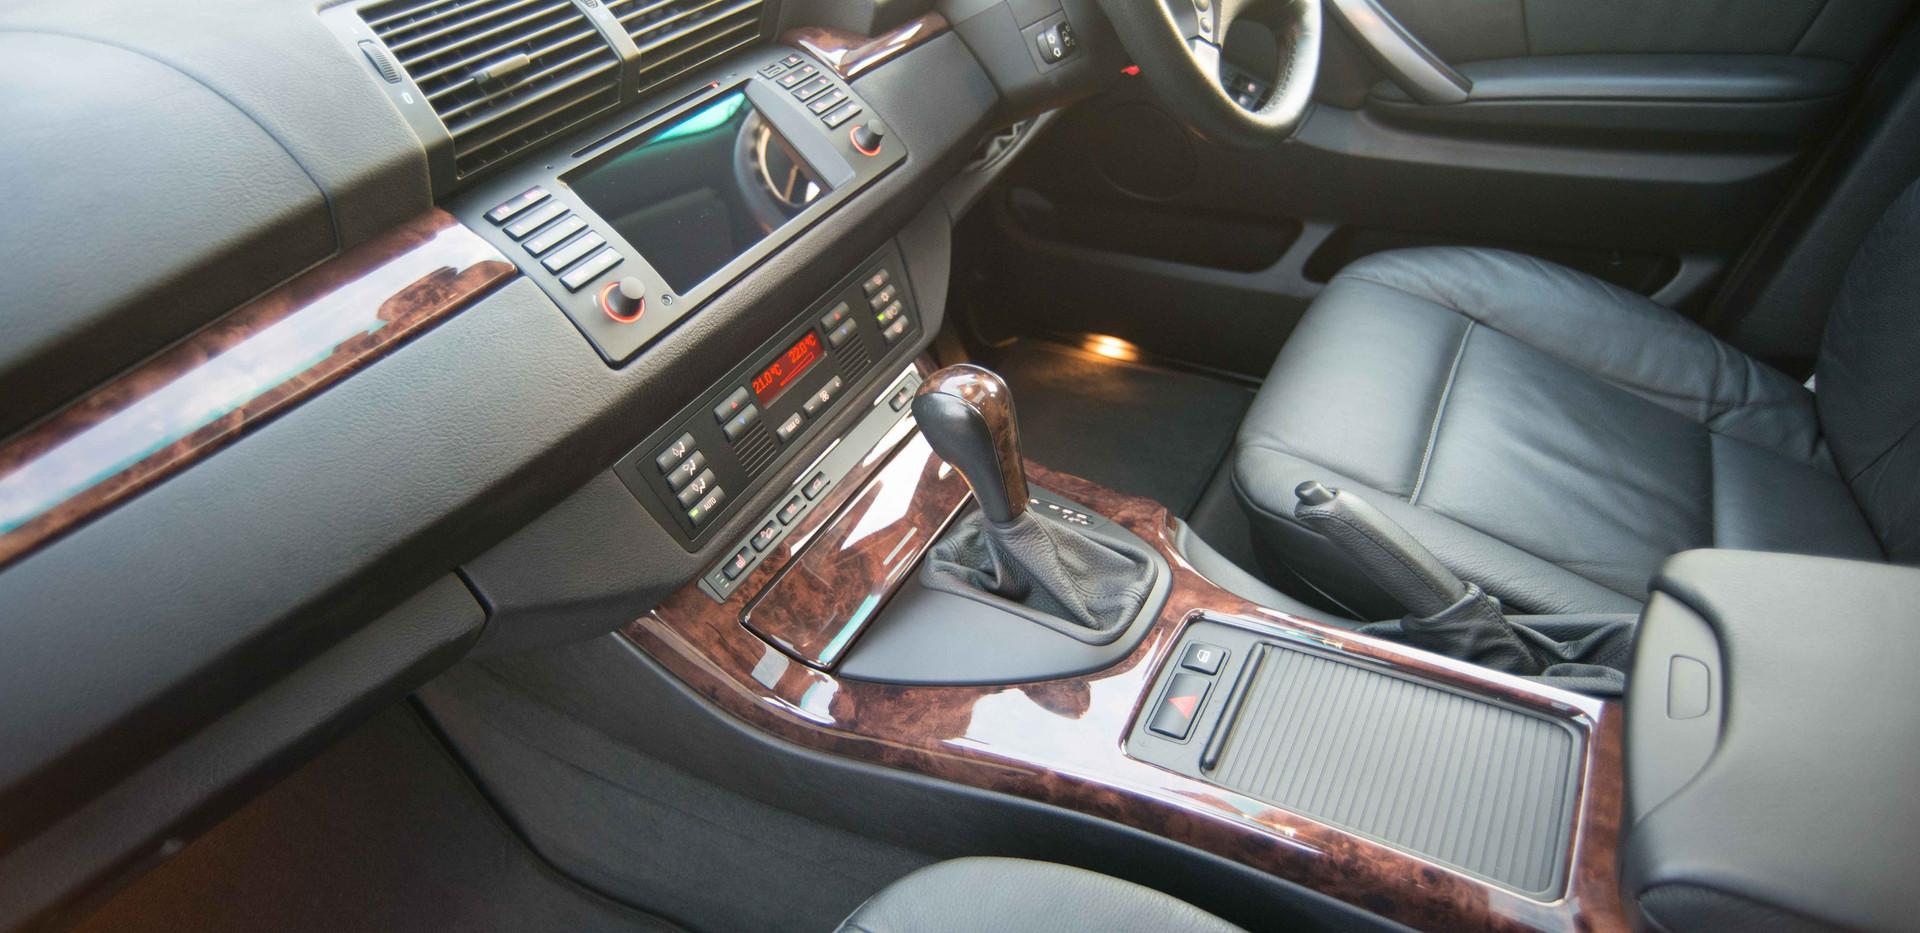 BMW E53 X5 4.4i For Sale UK London  (17